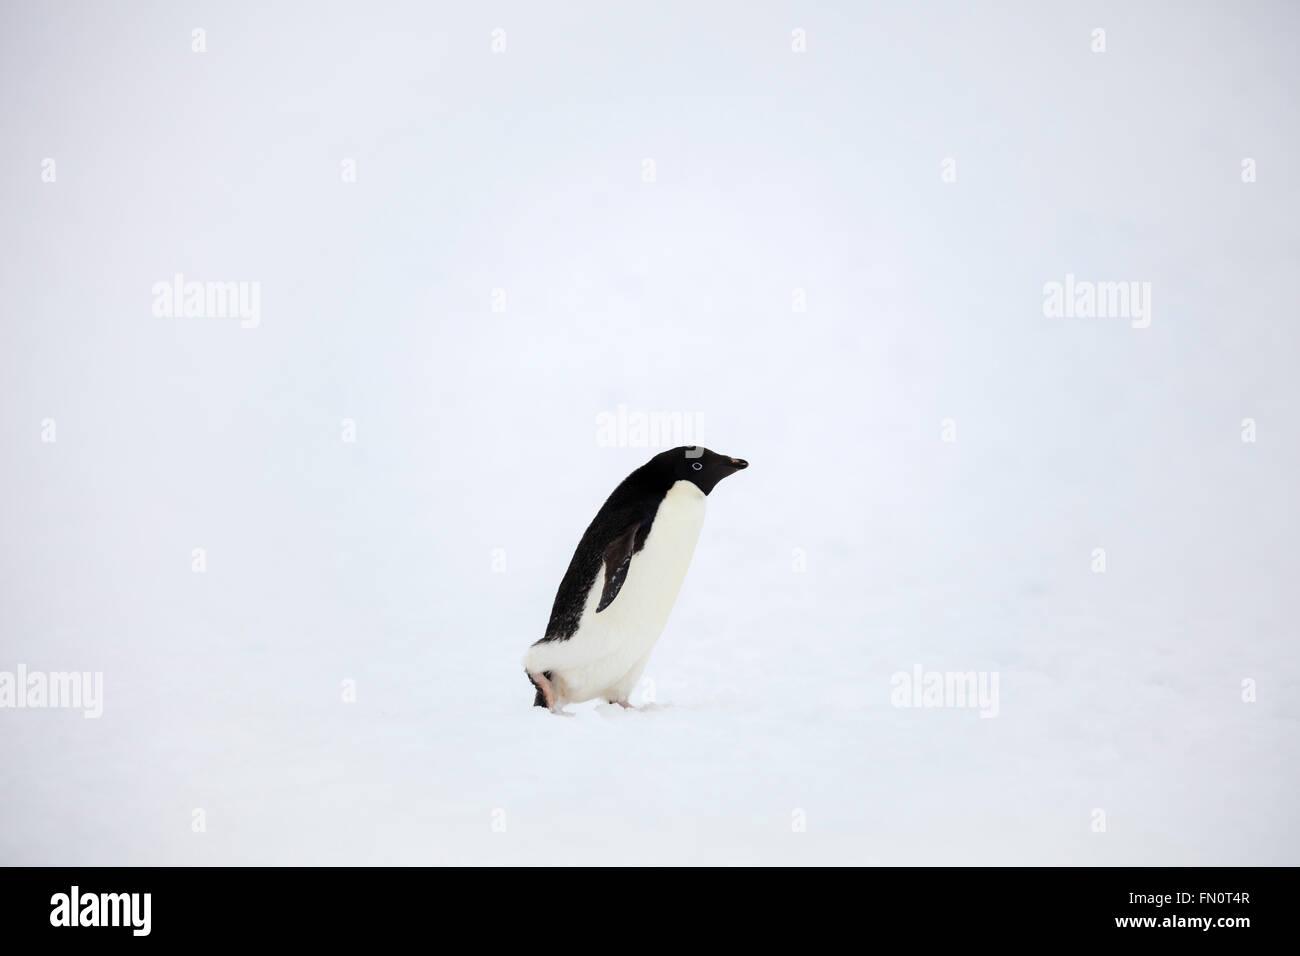 Antarktis, antarktische Halbinsel, Petermann Island, Adelie Pinguin, Stockbild